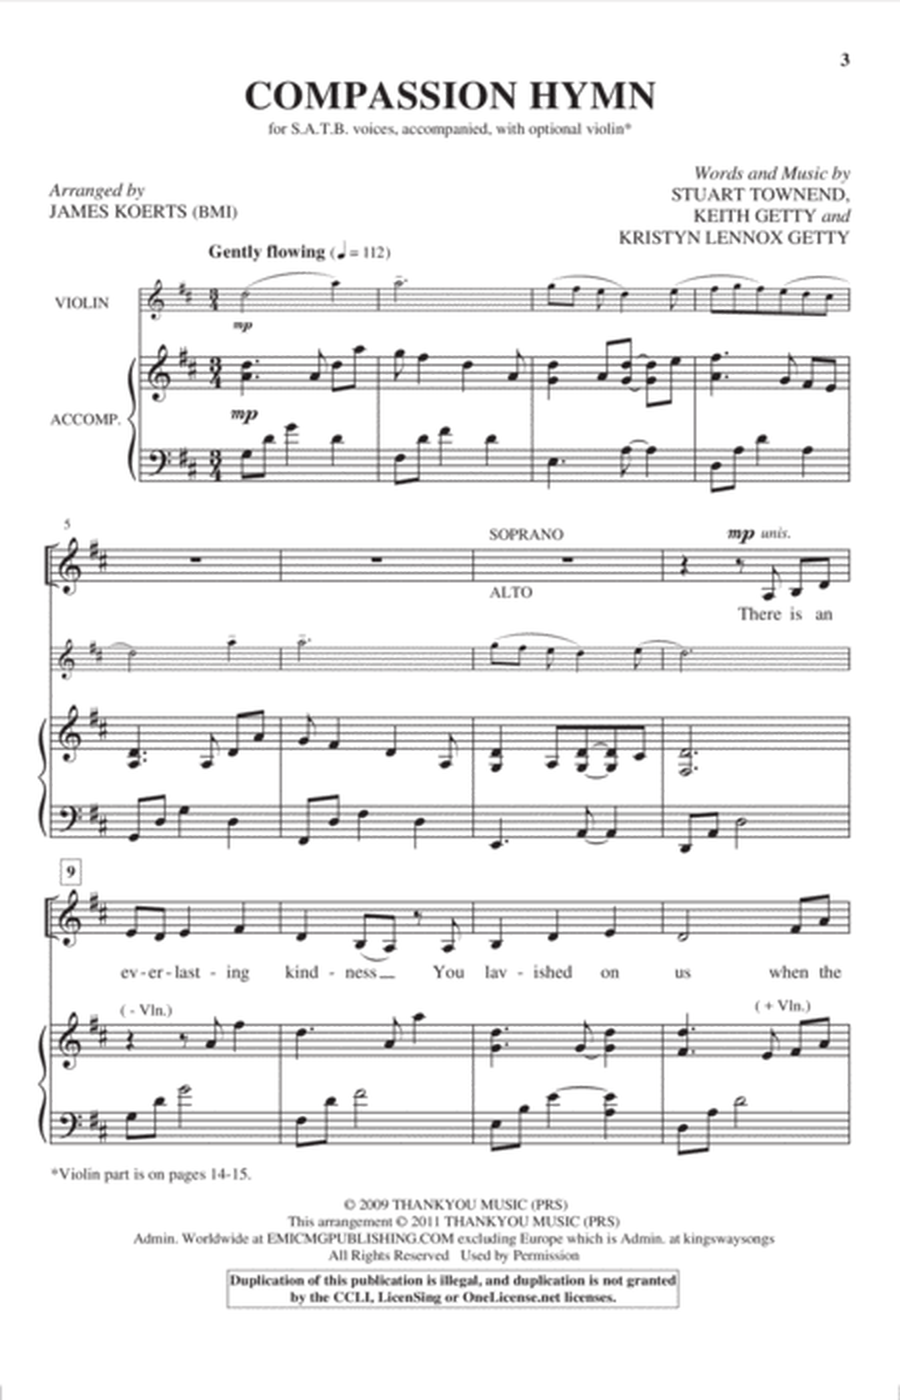 Compassion Hymn